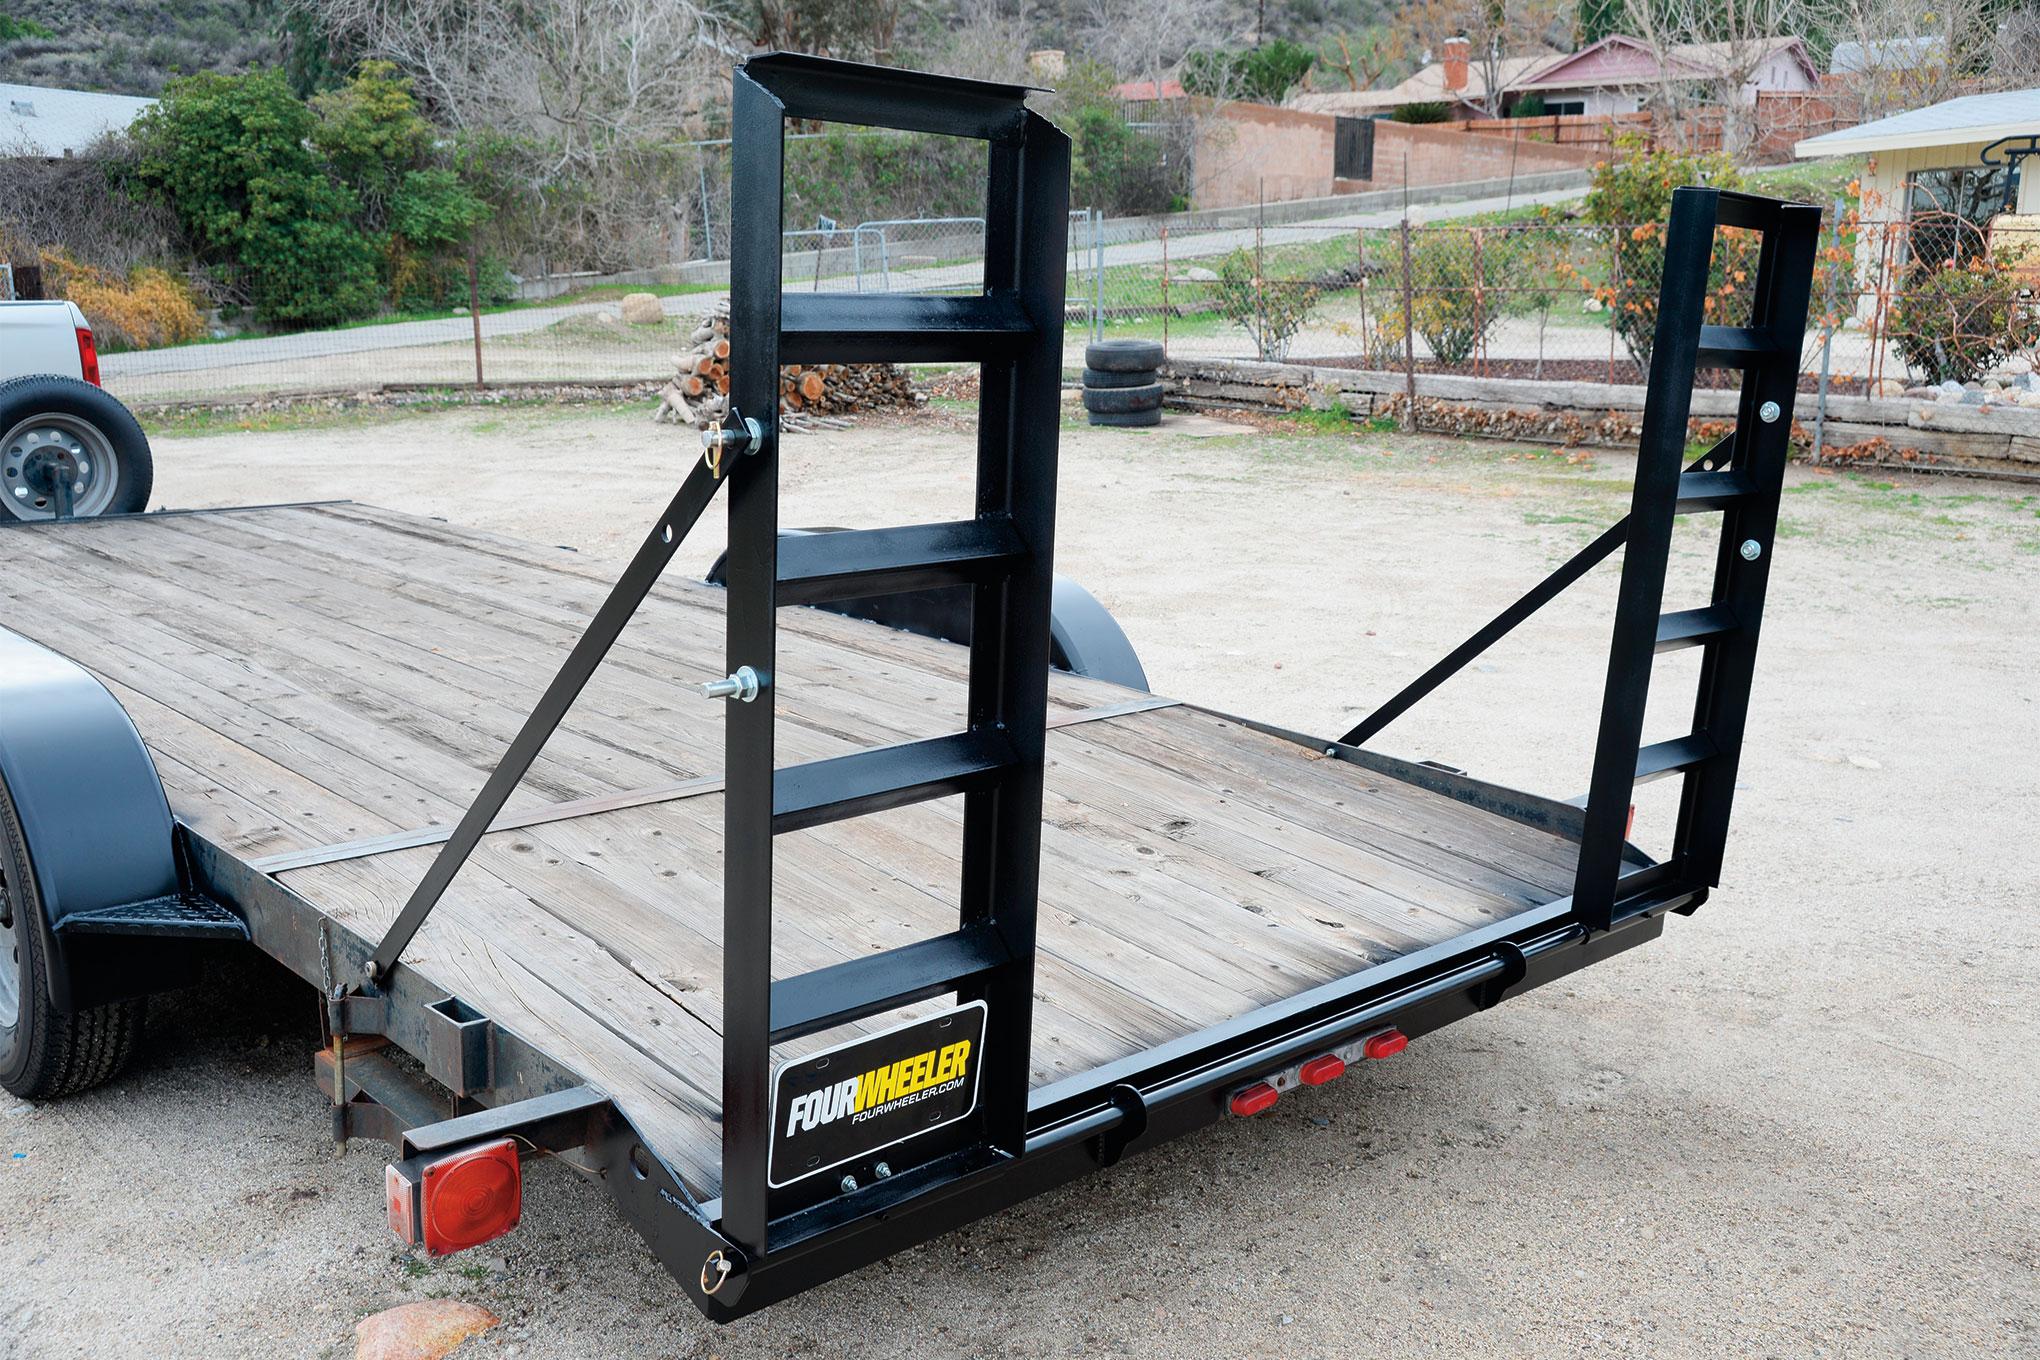 001 trailer ramps loading car hauler cappa fabrication project weld welding